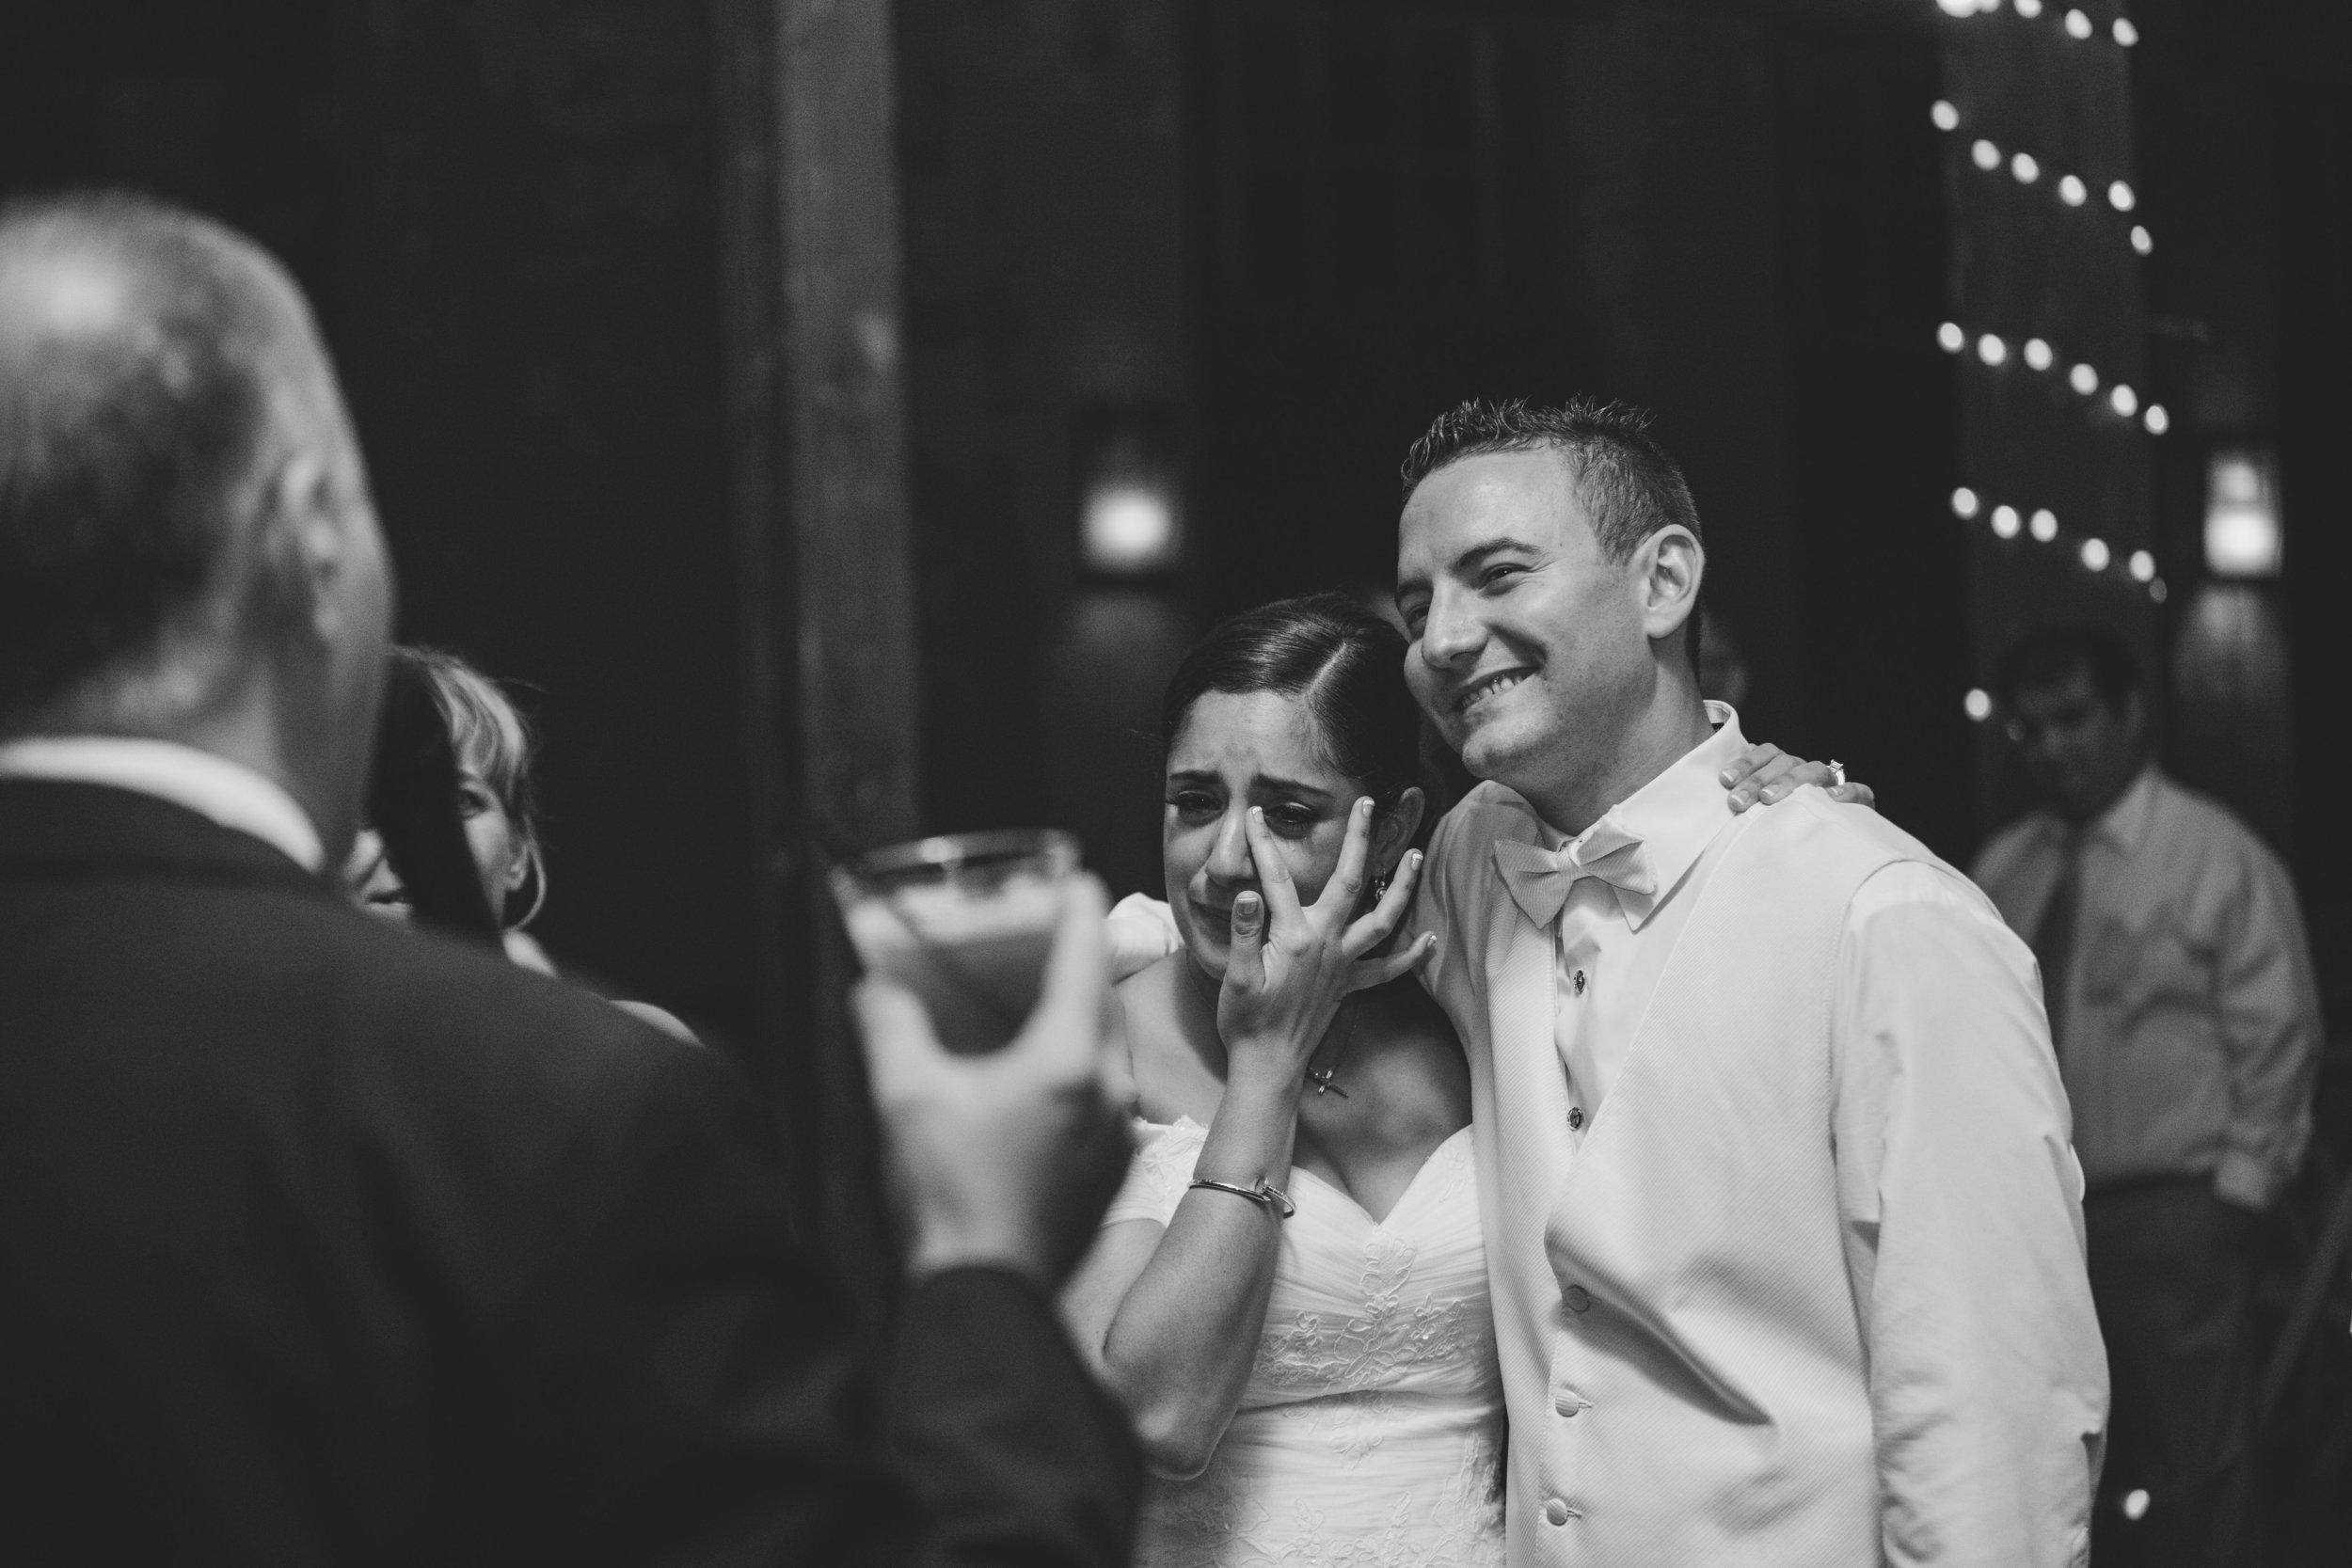 ATGI_Magali & Josh Wedding1_2S8A2988.jpg